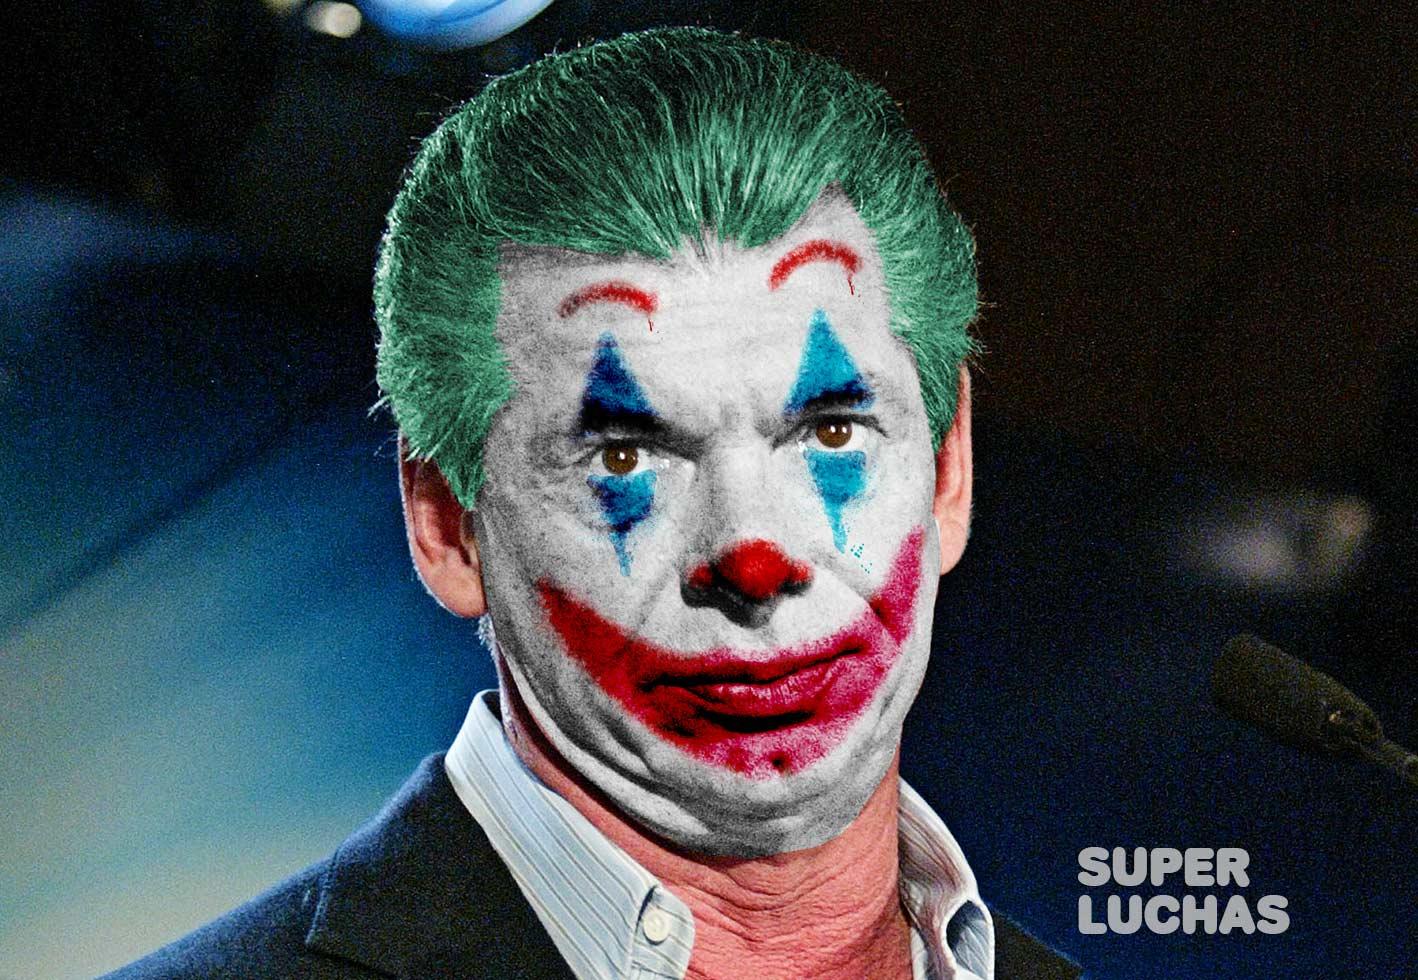 Vince McMahon Joker